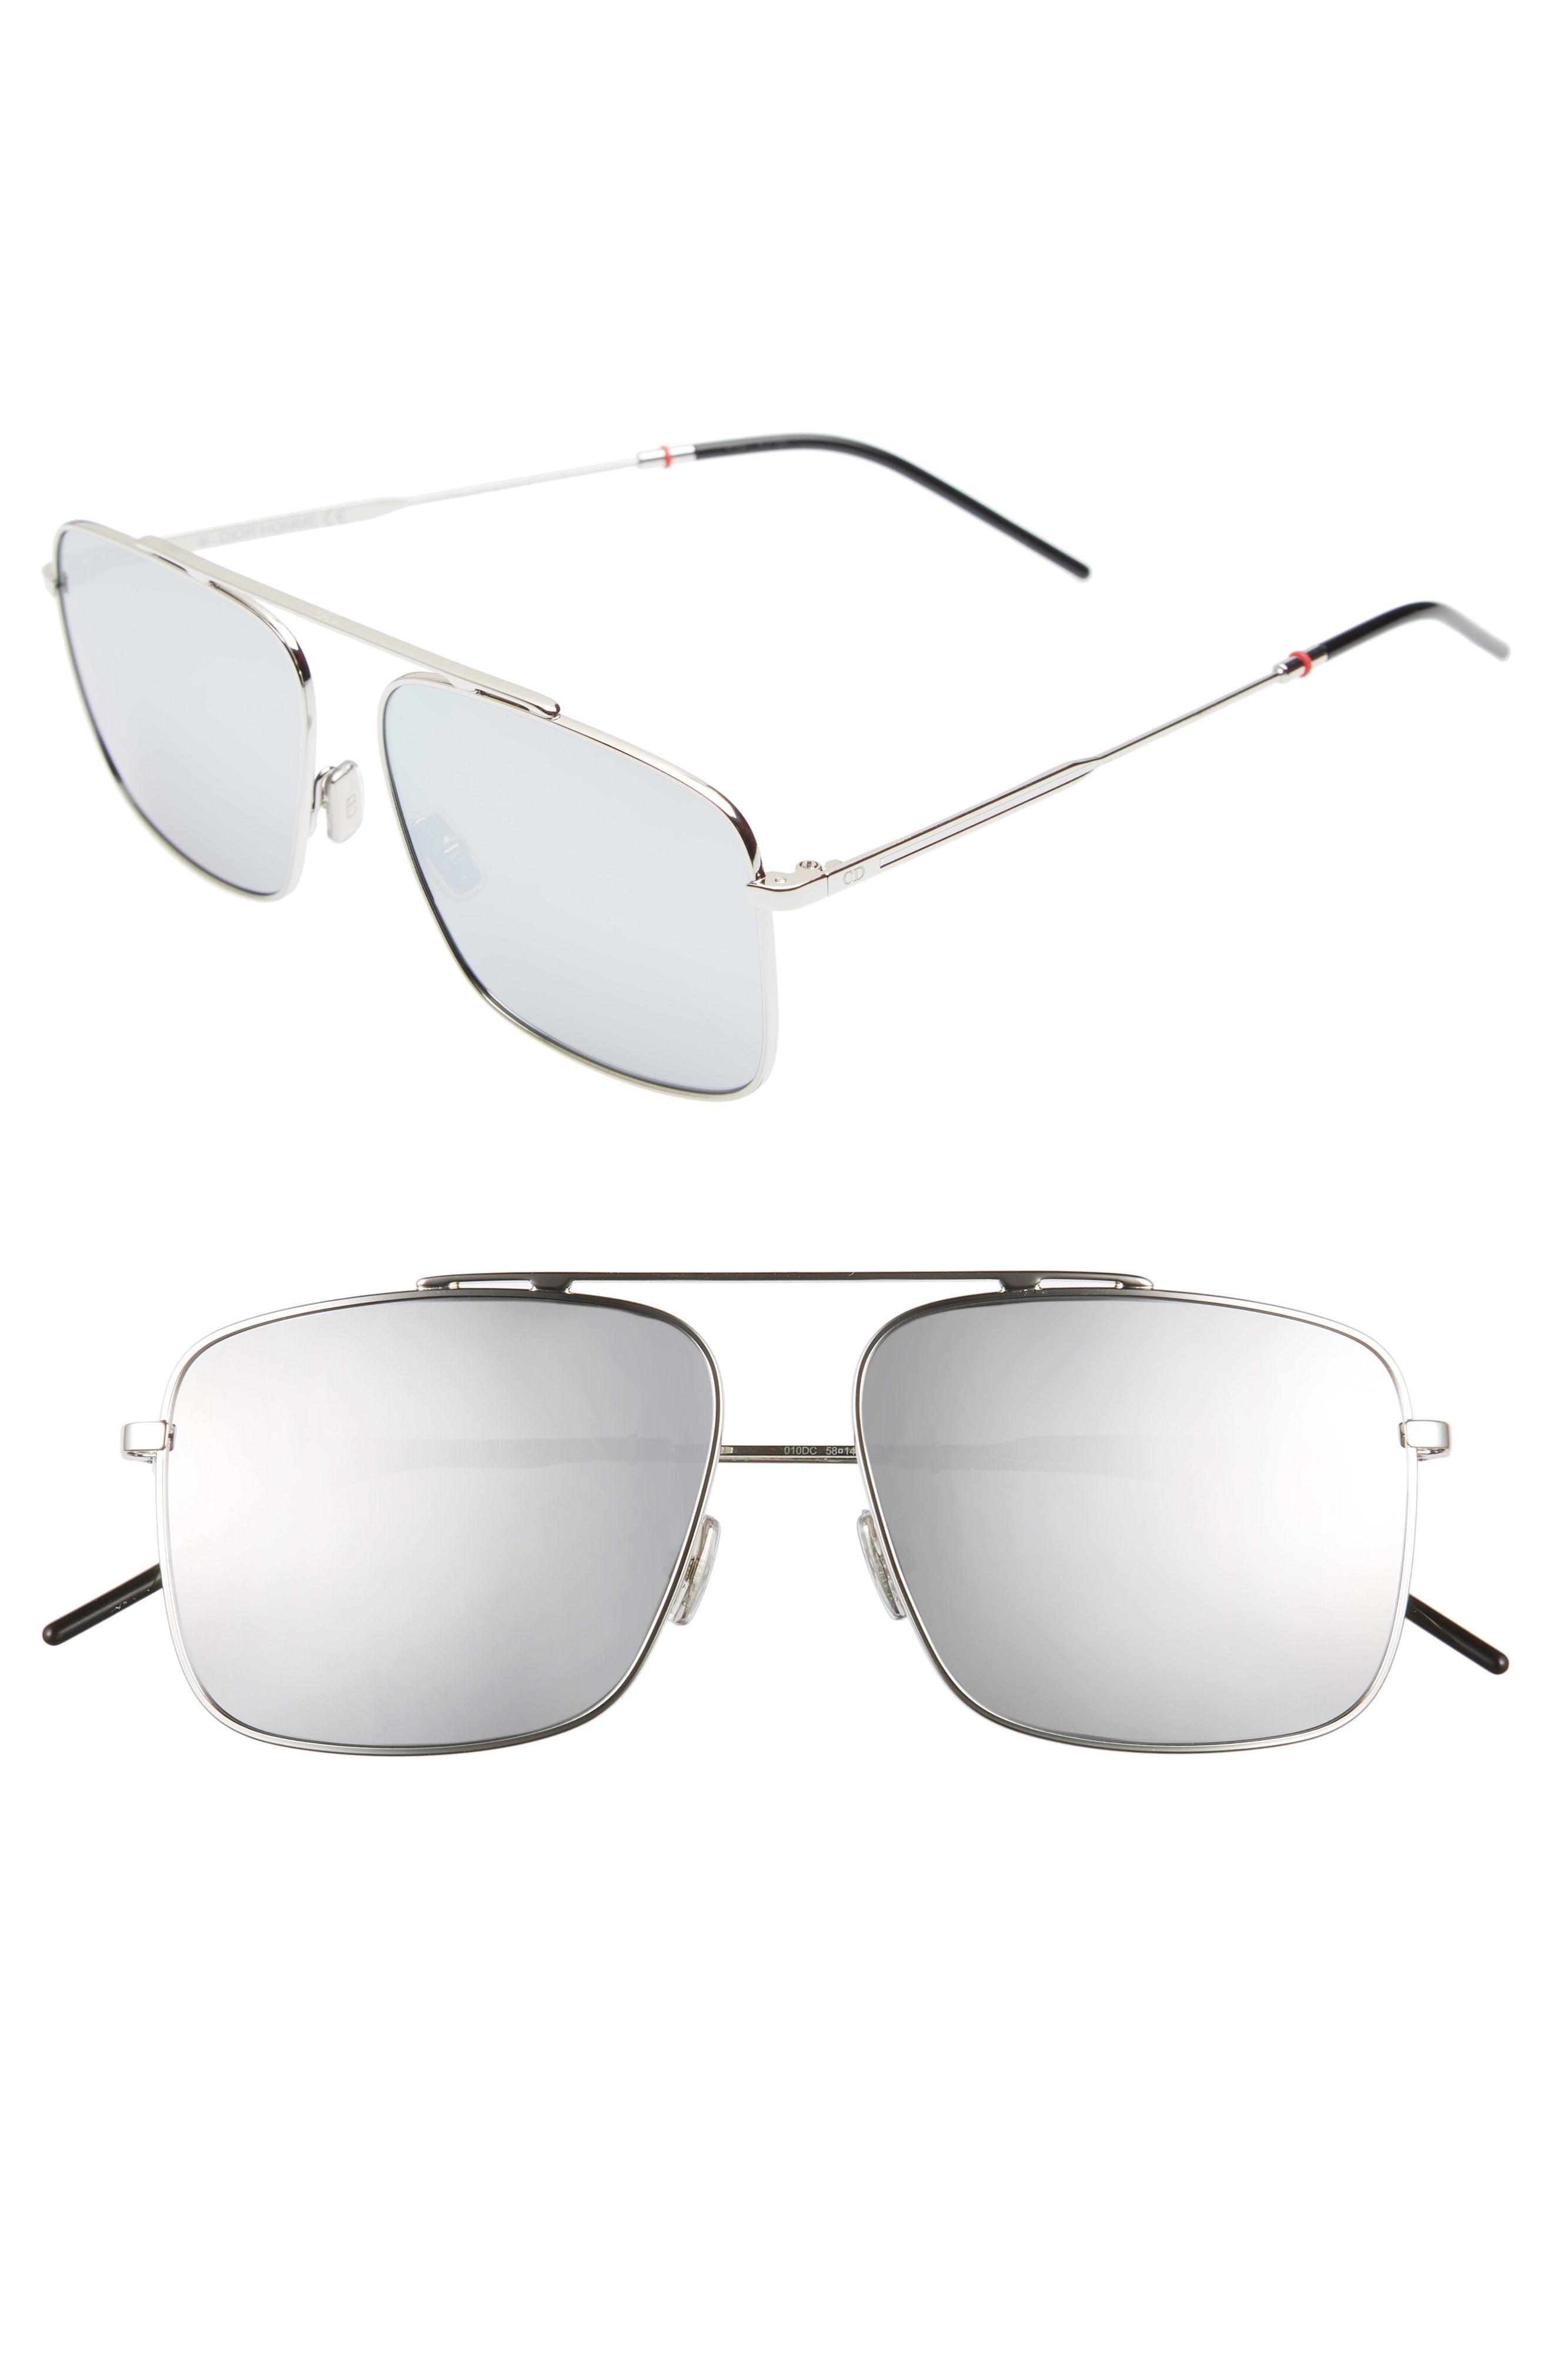 74f1d0191a9 Lyst - Dior 58mm Mirrored Navigator Sunglasses - for Men